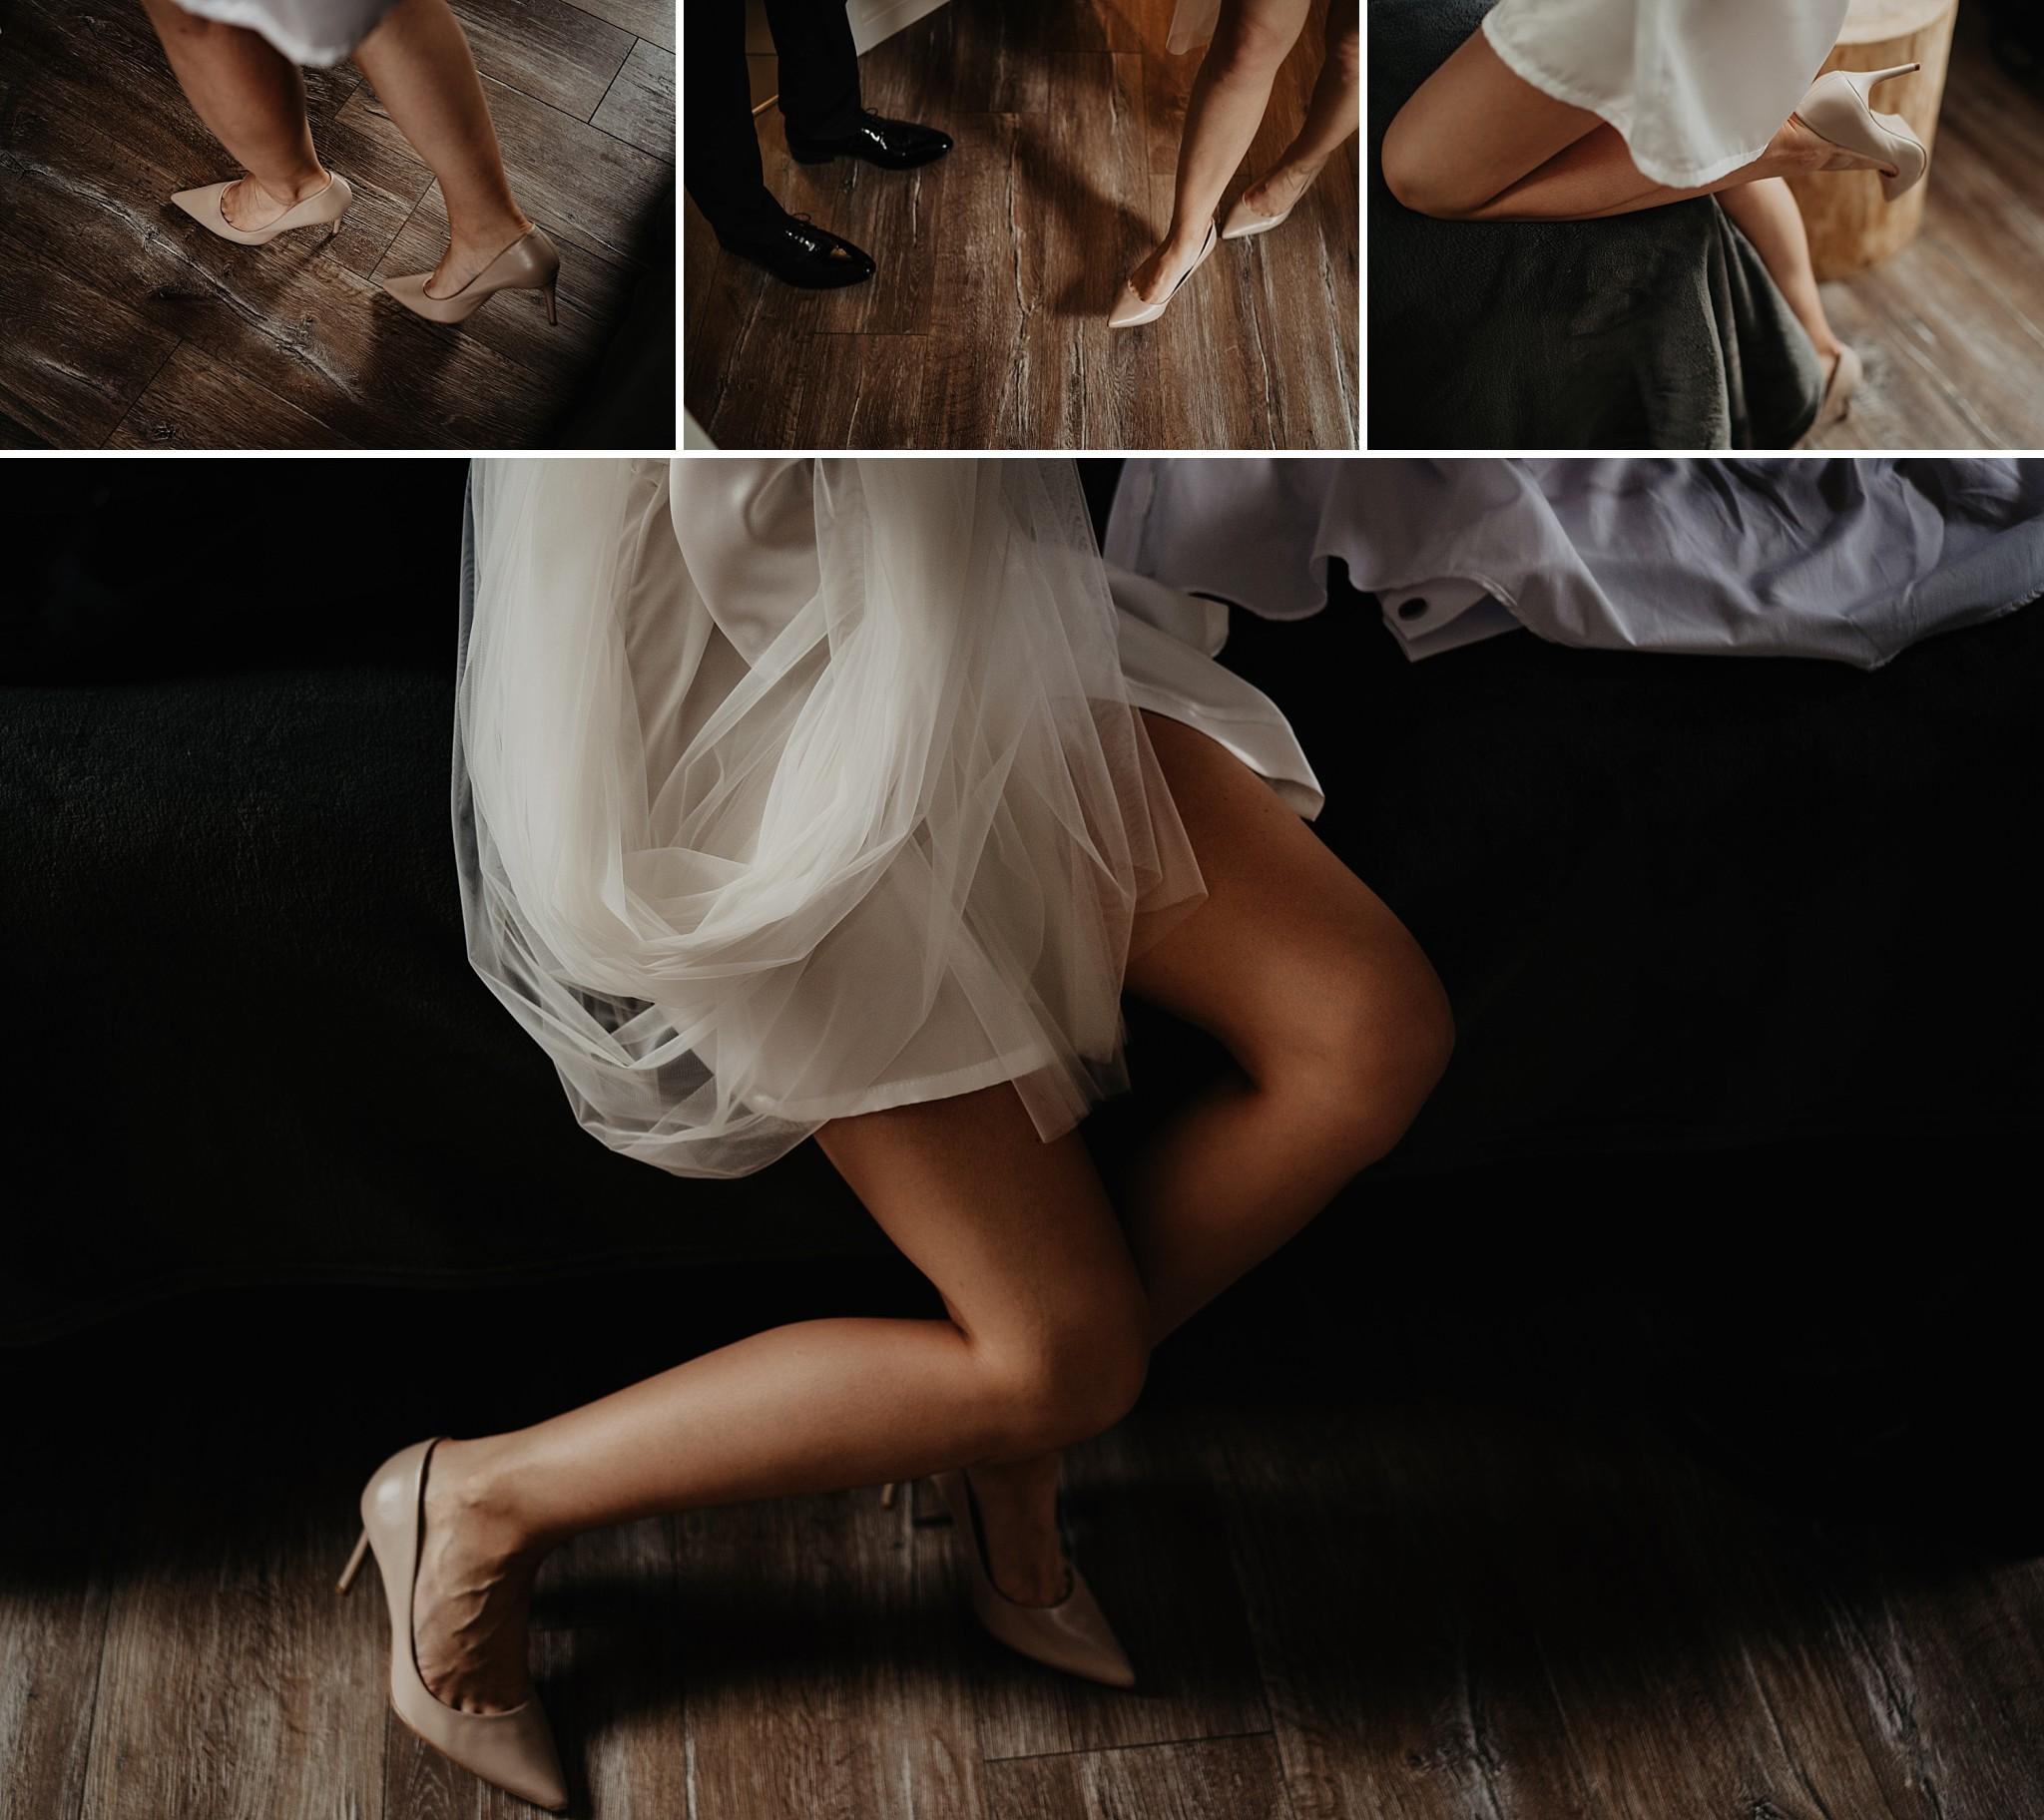 fotograf poznan wesele dobra truskawka piekne wesele pod poznaniem wesele w dobrej truskawce piekna para mloda slub marzen slub koronawirus slub listopad wesele koronawirus 057